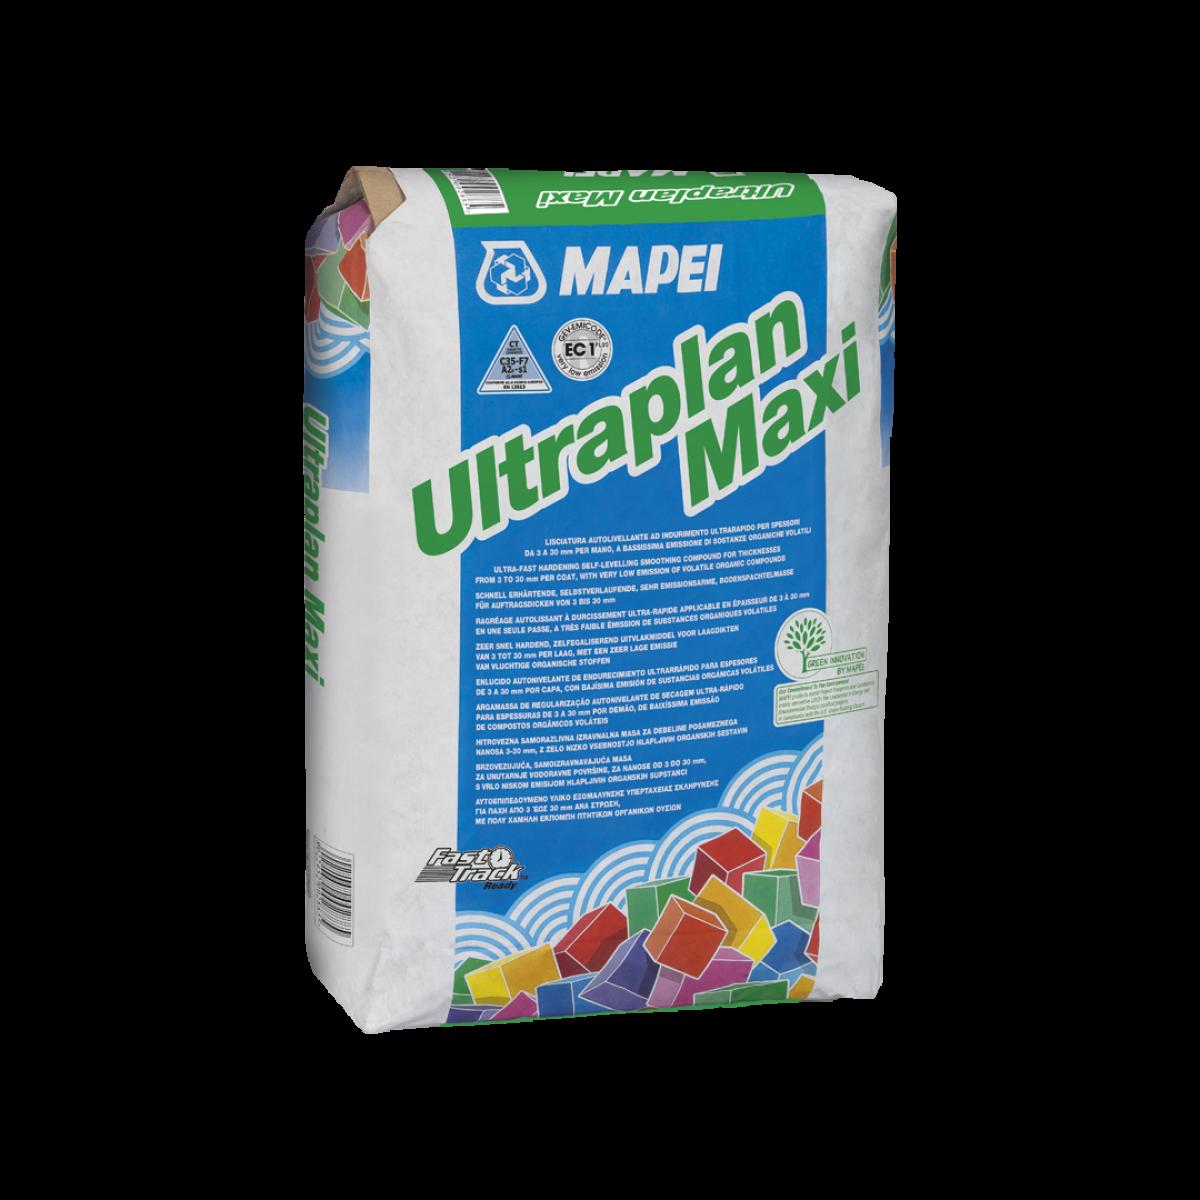 ULTRAPLAN MAXI Lisciatura autolivellante ad indurimento ultrarapido per spessori da 3 a 40 mm.